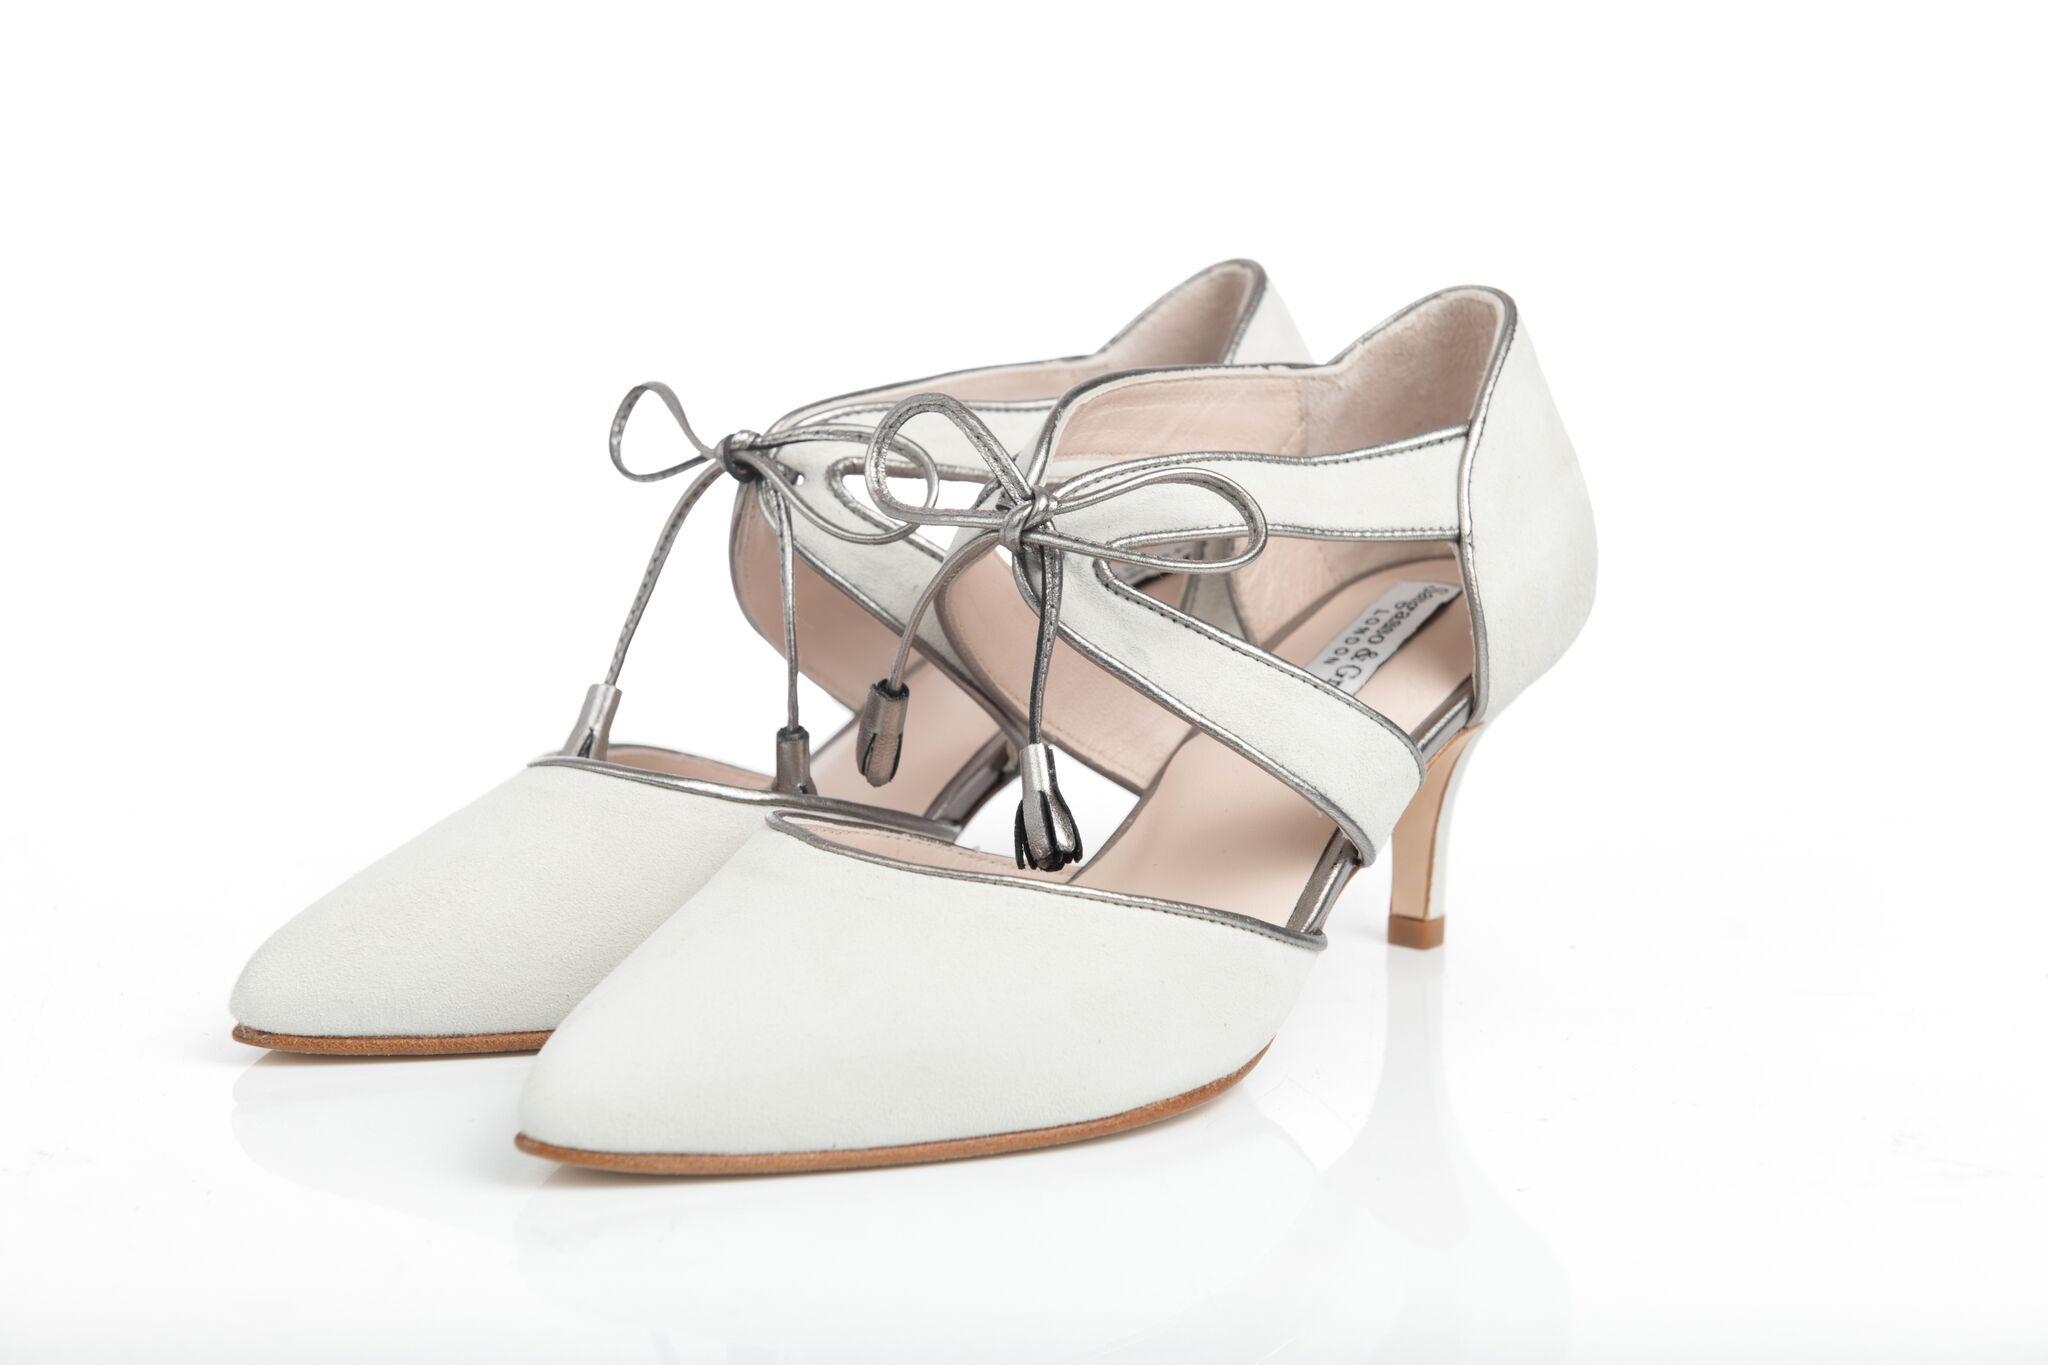 39e771c37cc2 Iris Ivory Wide Fit Bridal shoe by Sargasso   Grey